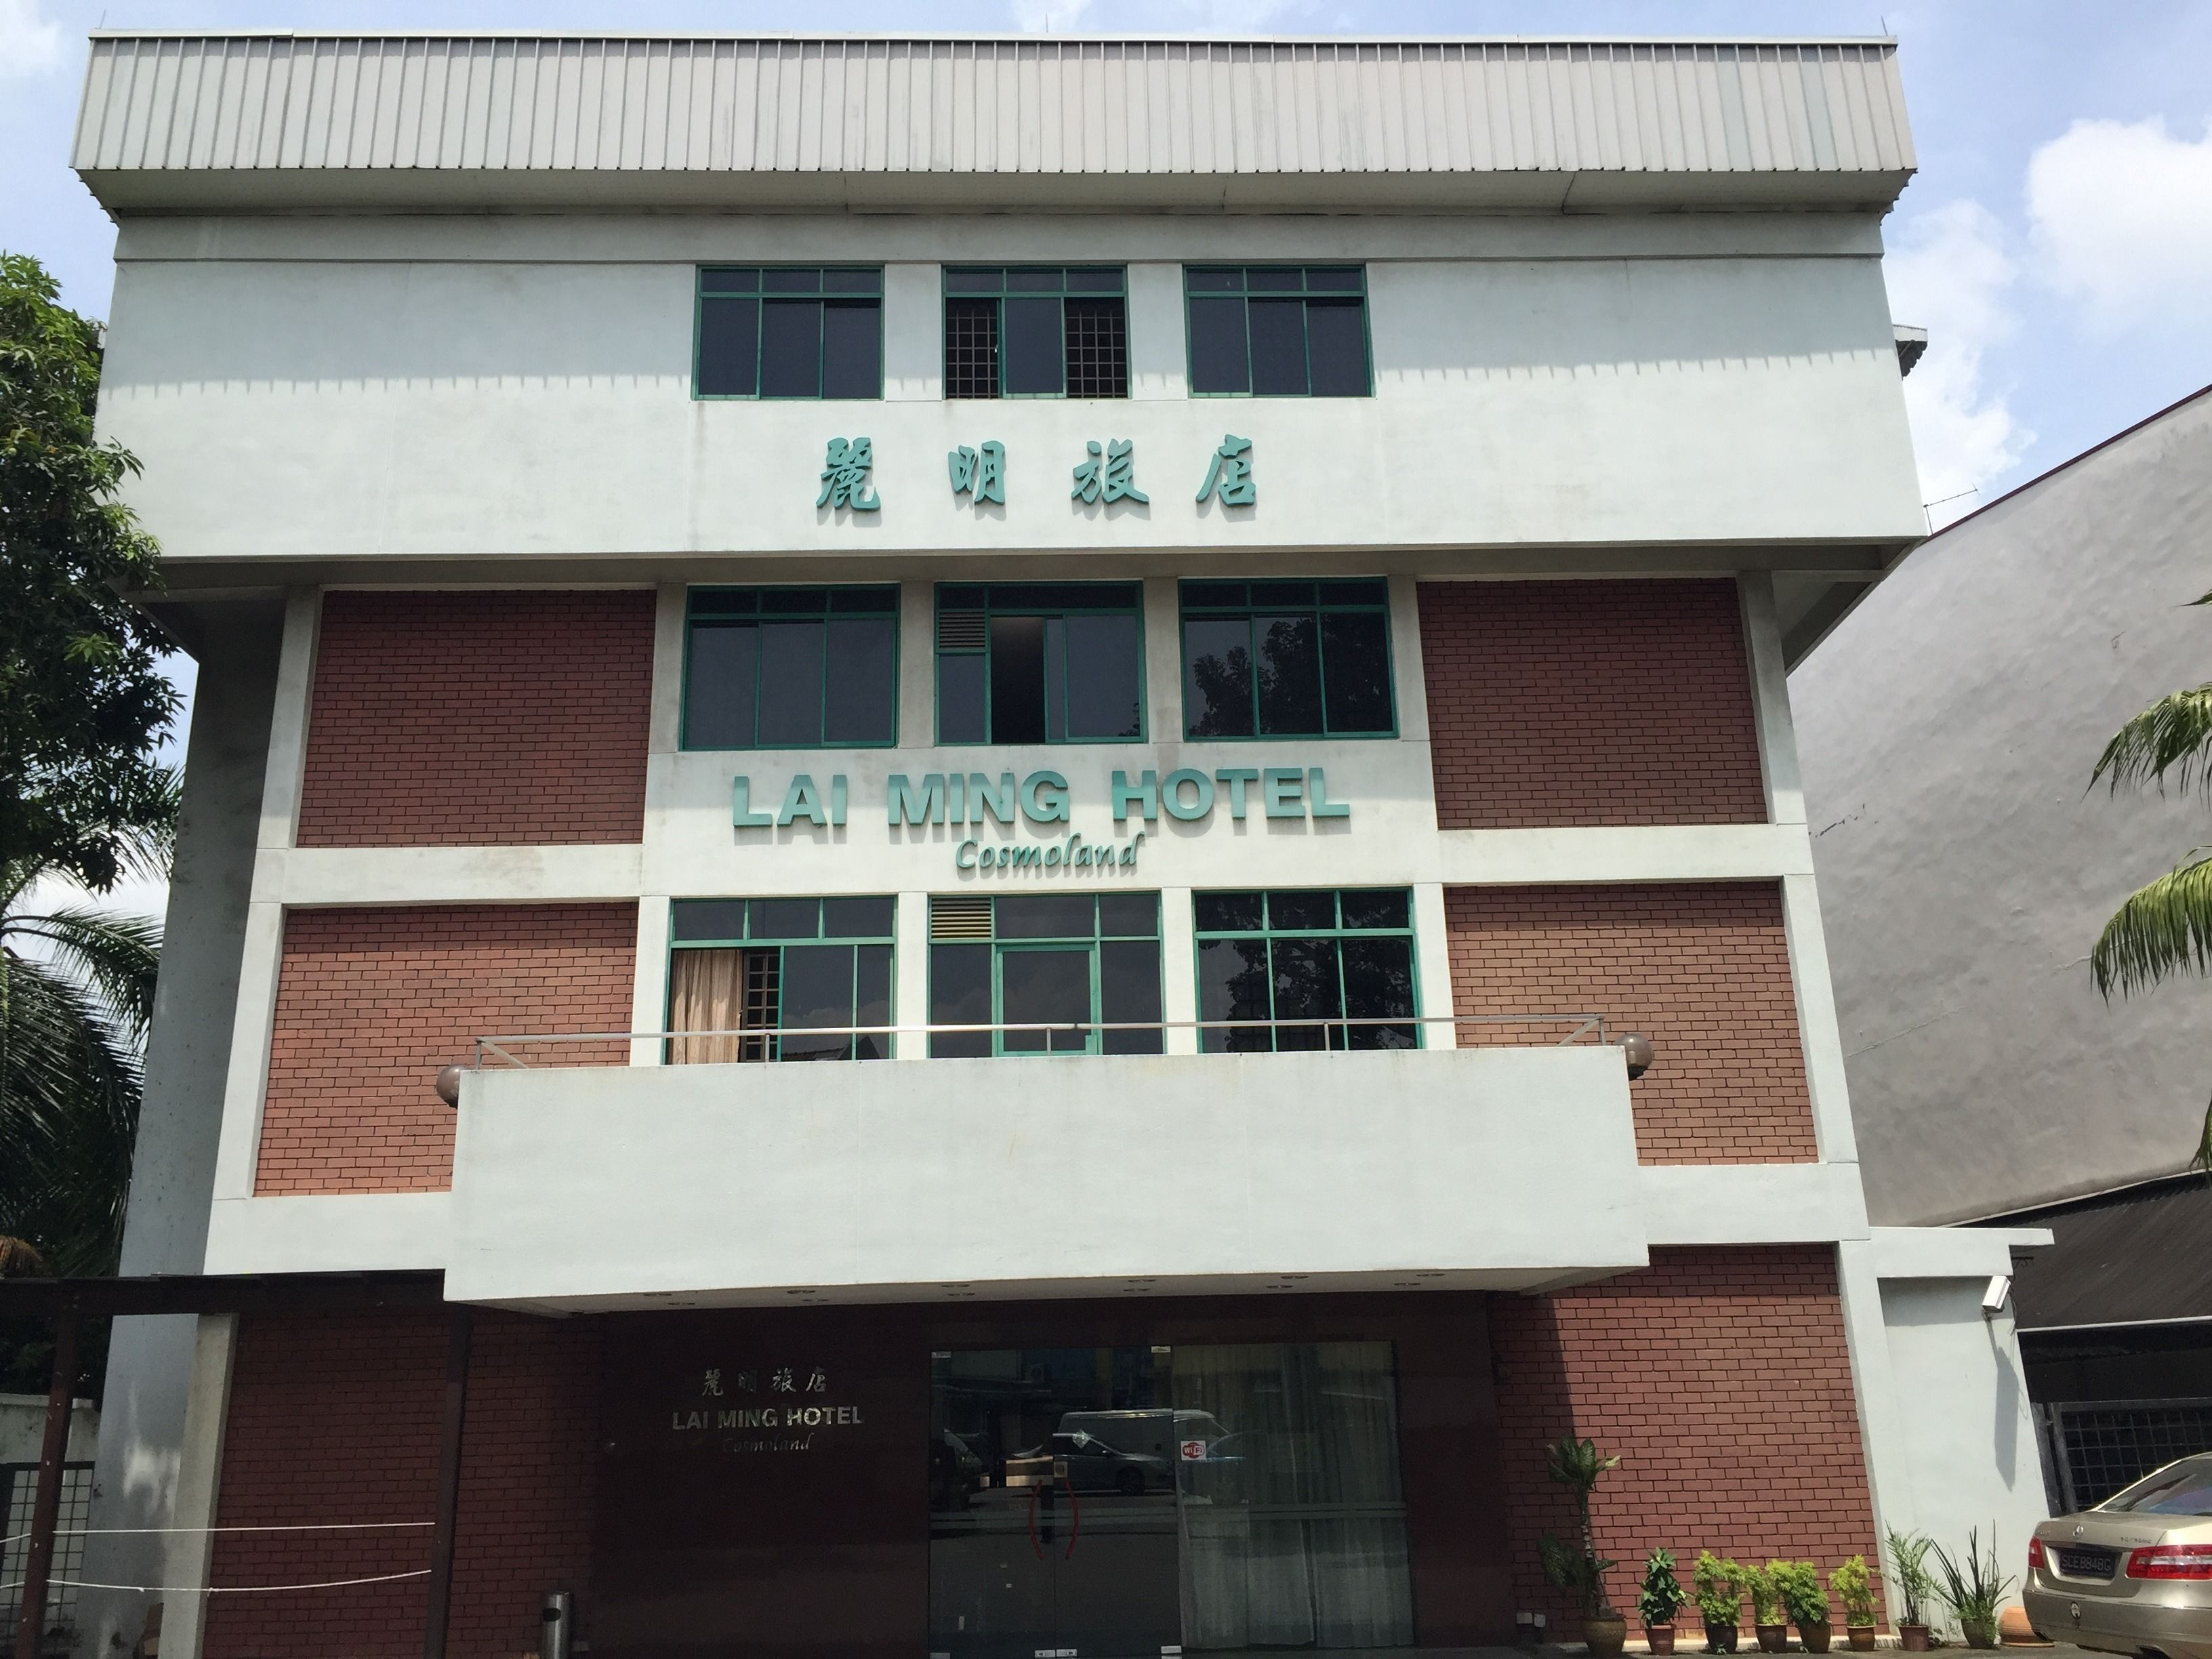 Lai Ming Hotel Cosmoland